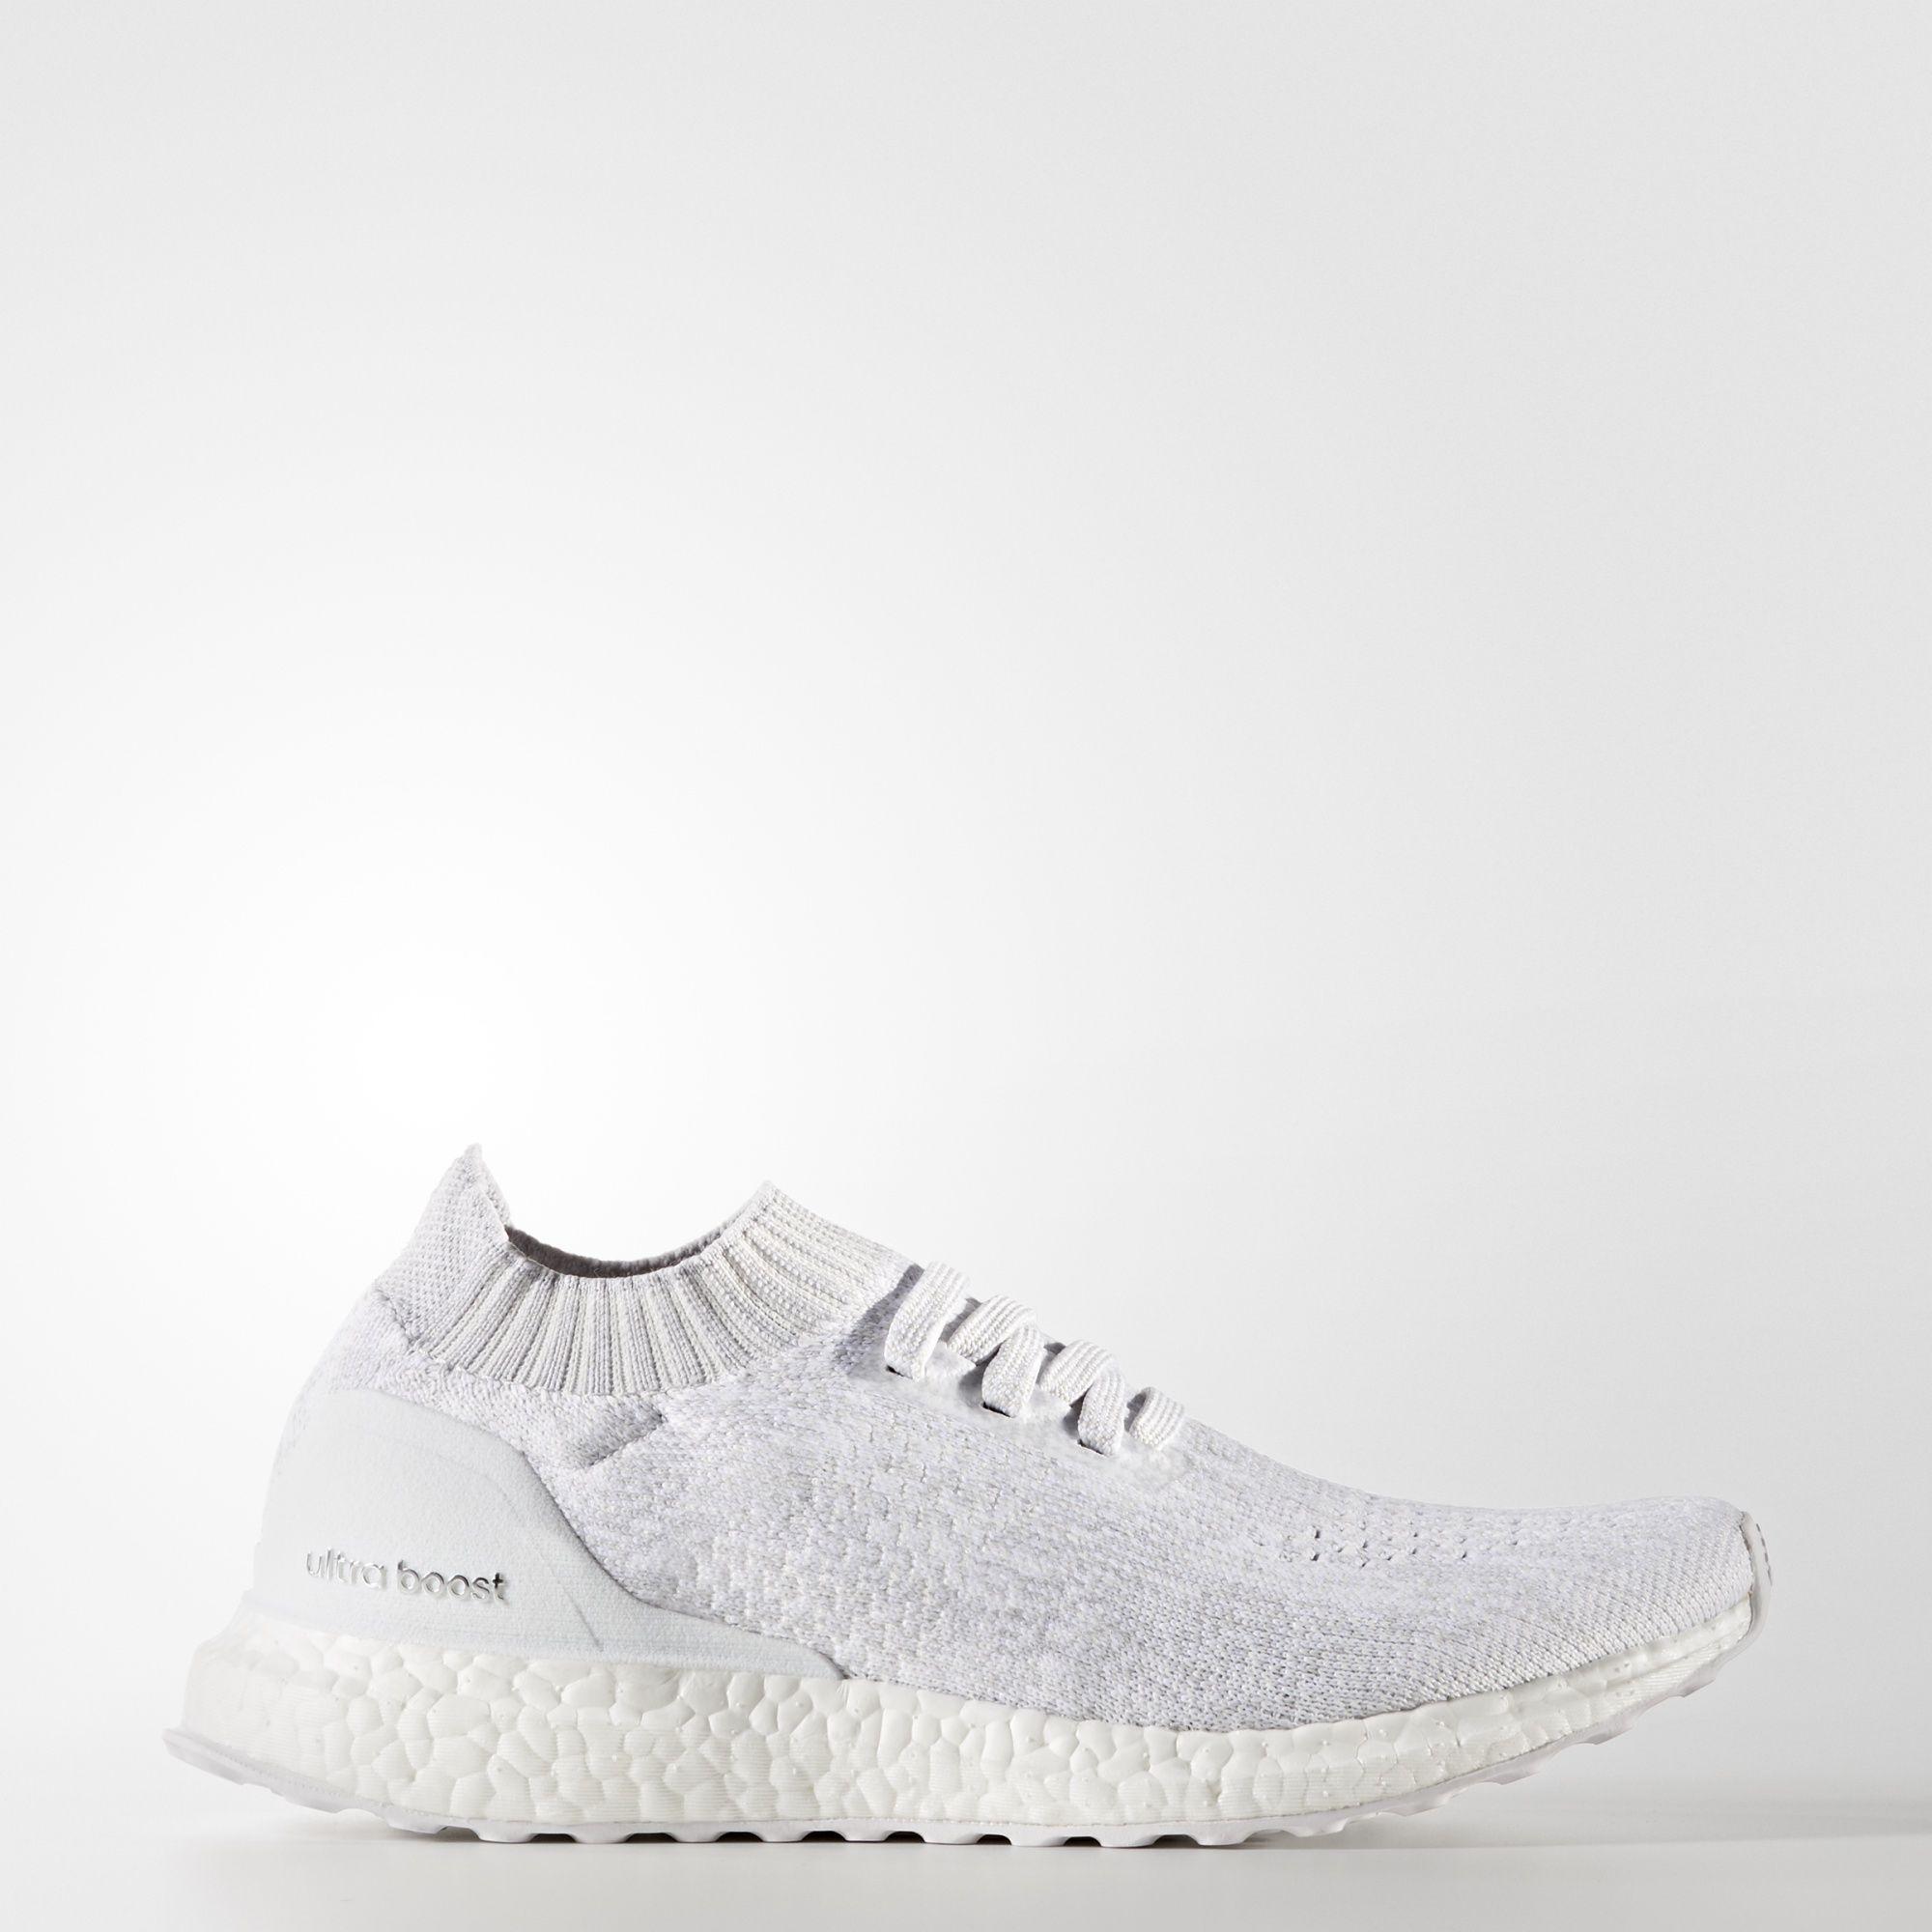 8f94c31b ... where can i buy adidas ultraboost uncaged sko 168a6 0de09